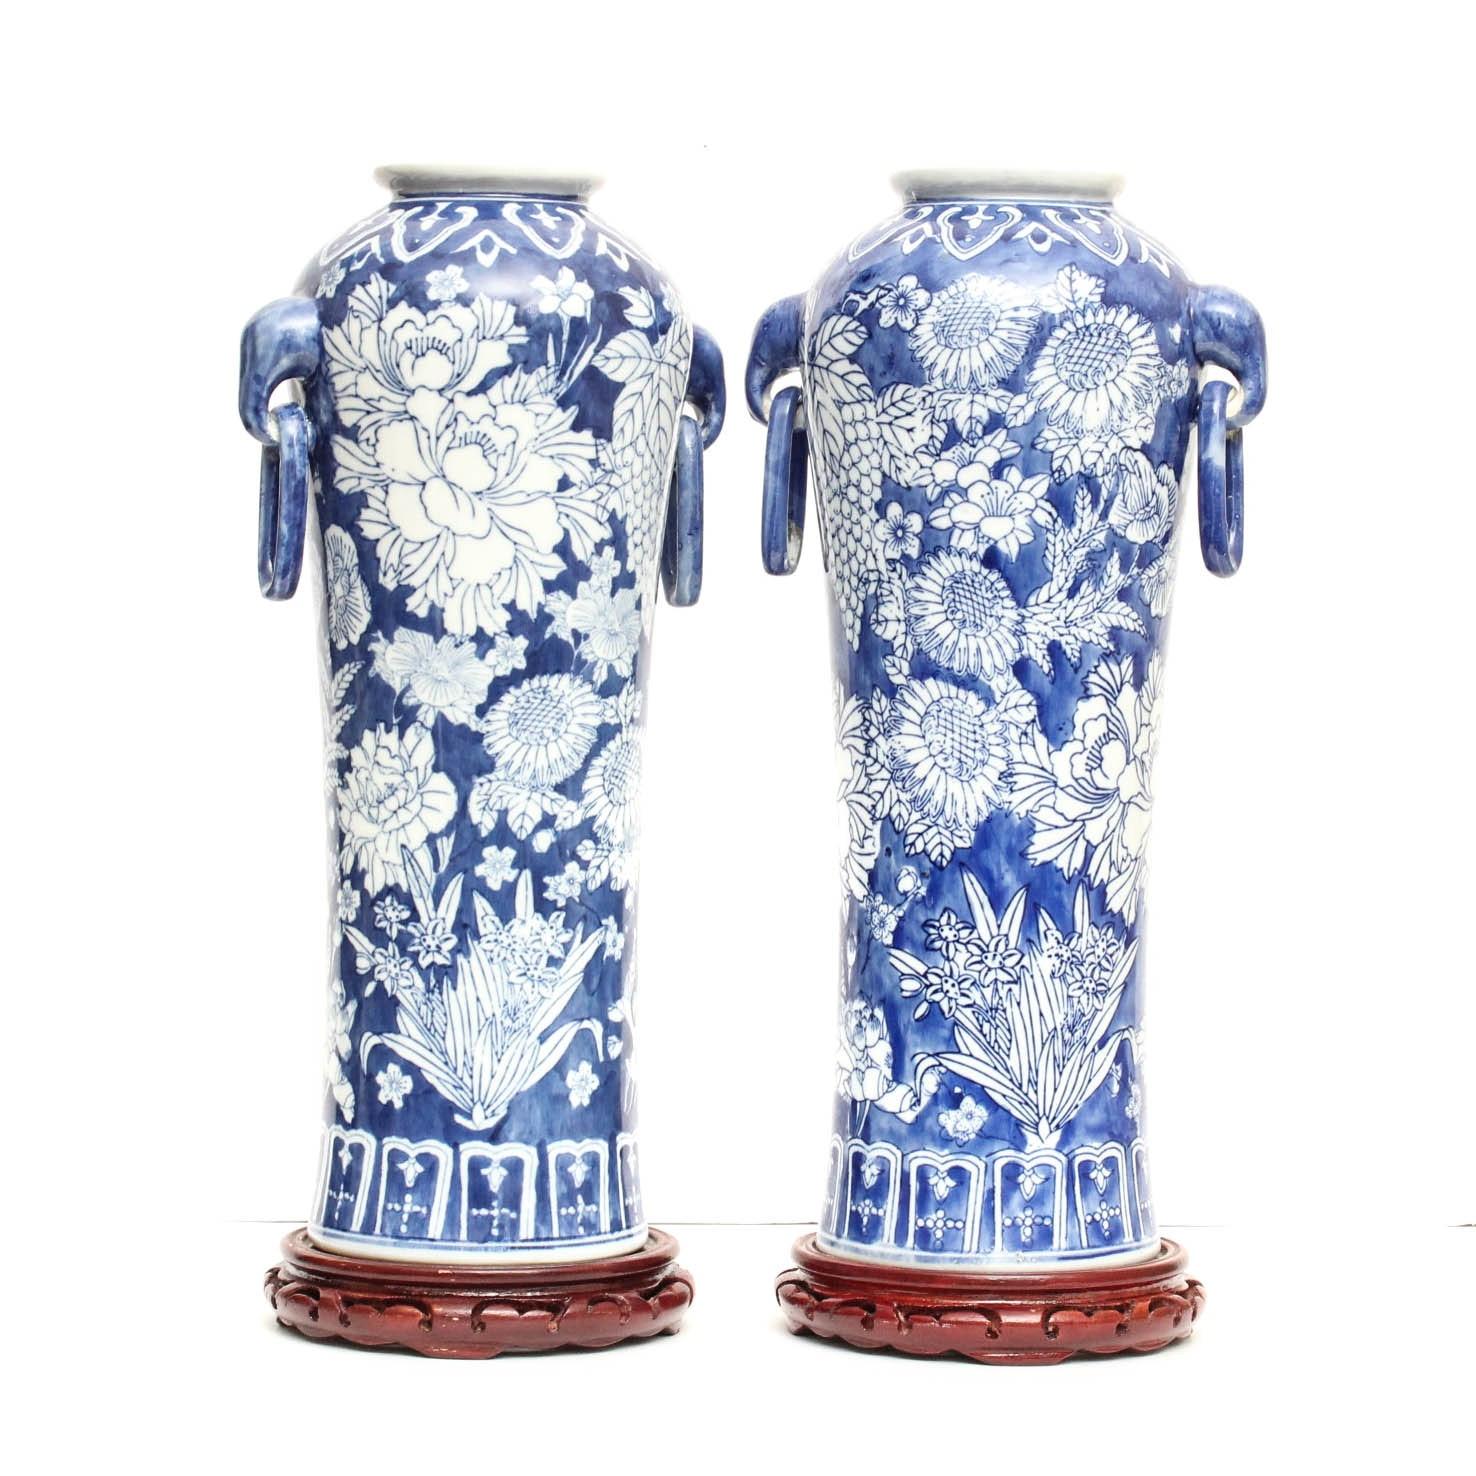 Vintage Chinese Porcelain Vases